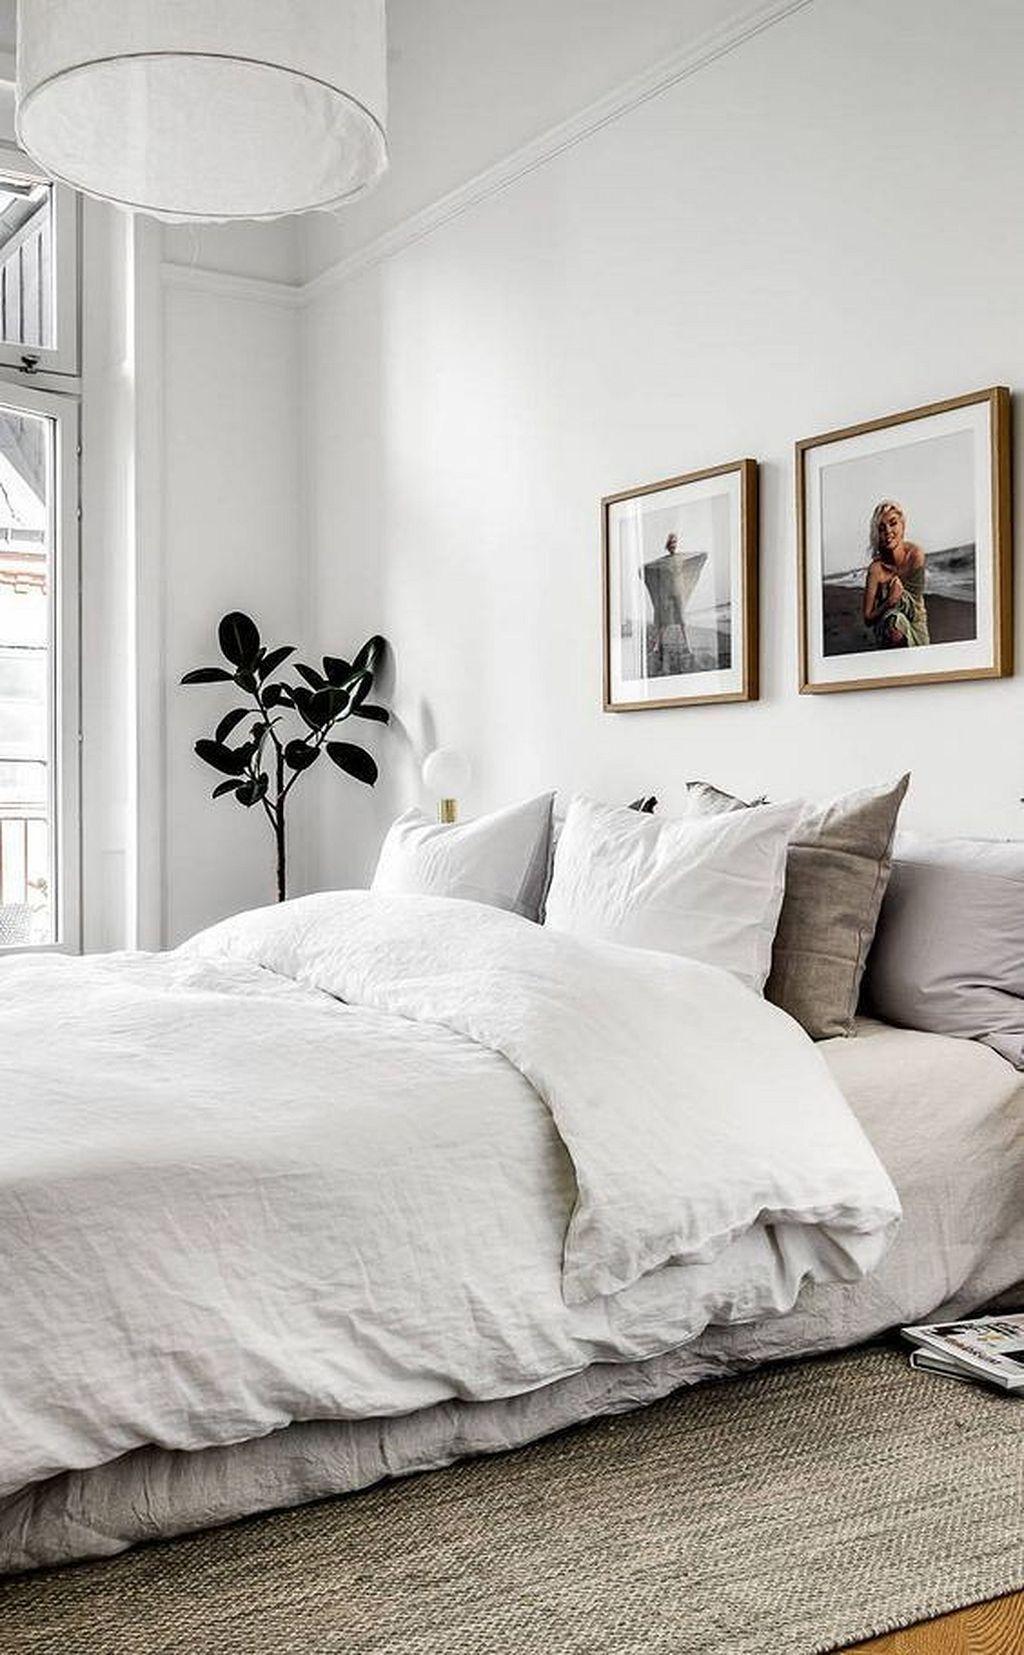 Cozy Small Bedroom Ideas Part - 34: Awesome 40+ Cozy Small Bedroom Ideas Https://modernhousemagz.com/40